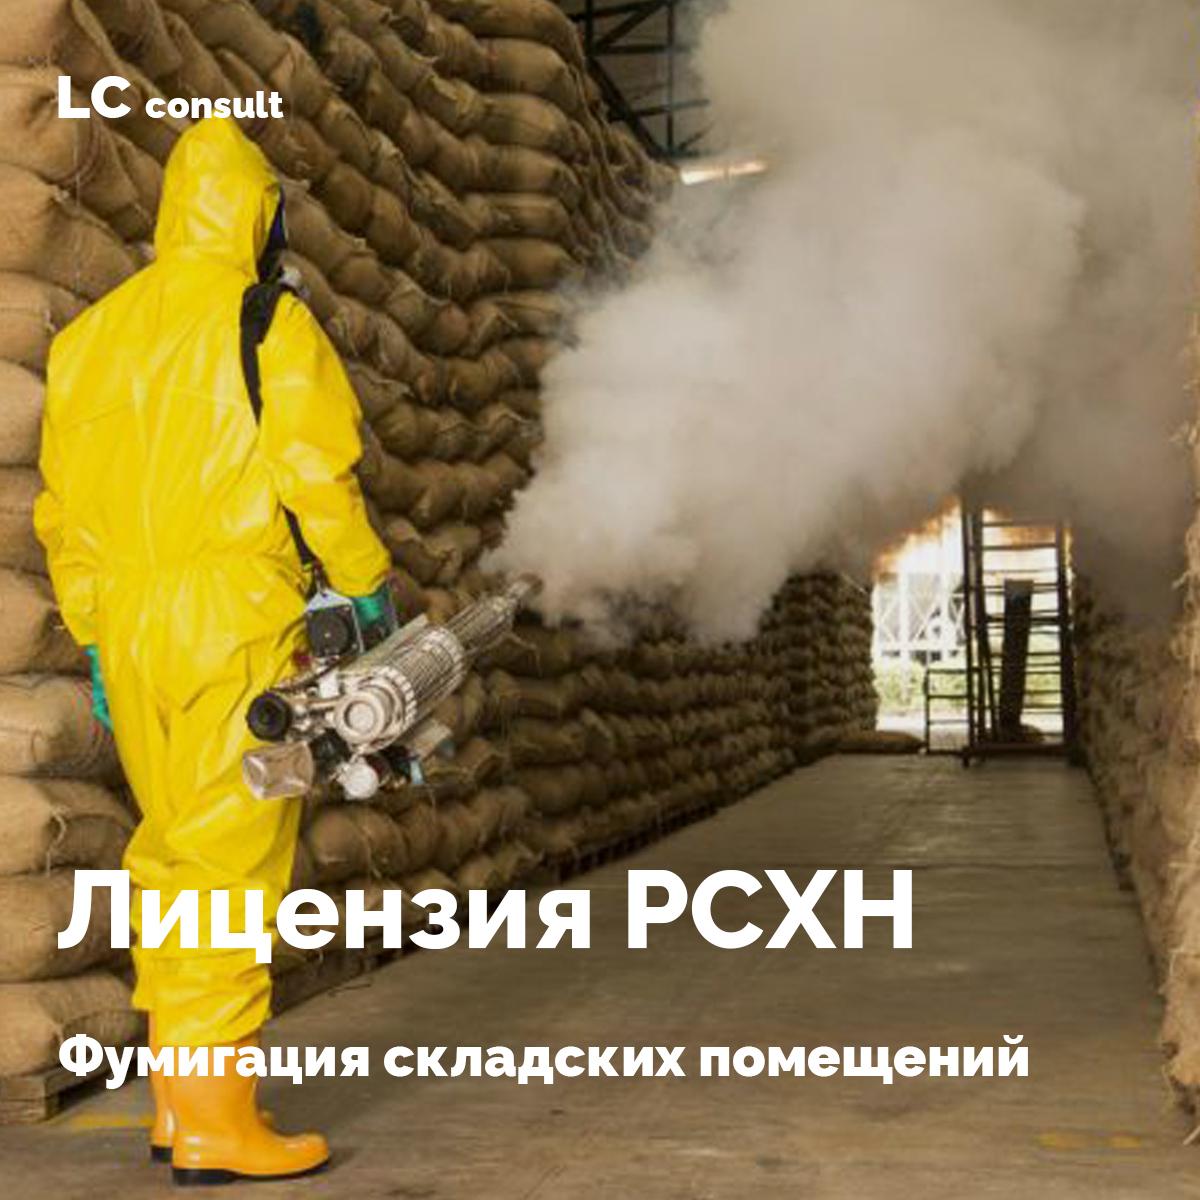 litsenzia-fumigatsia-sklad